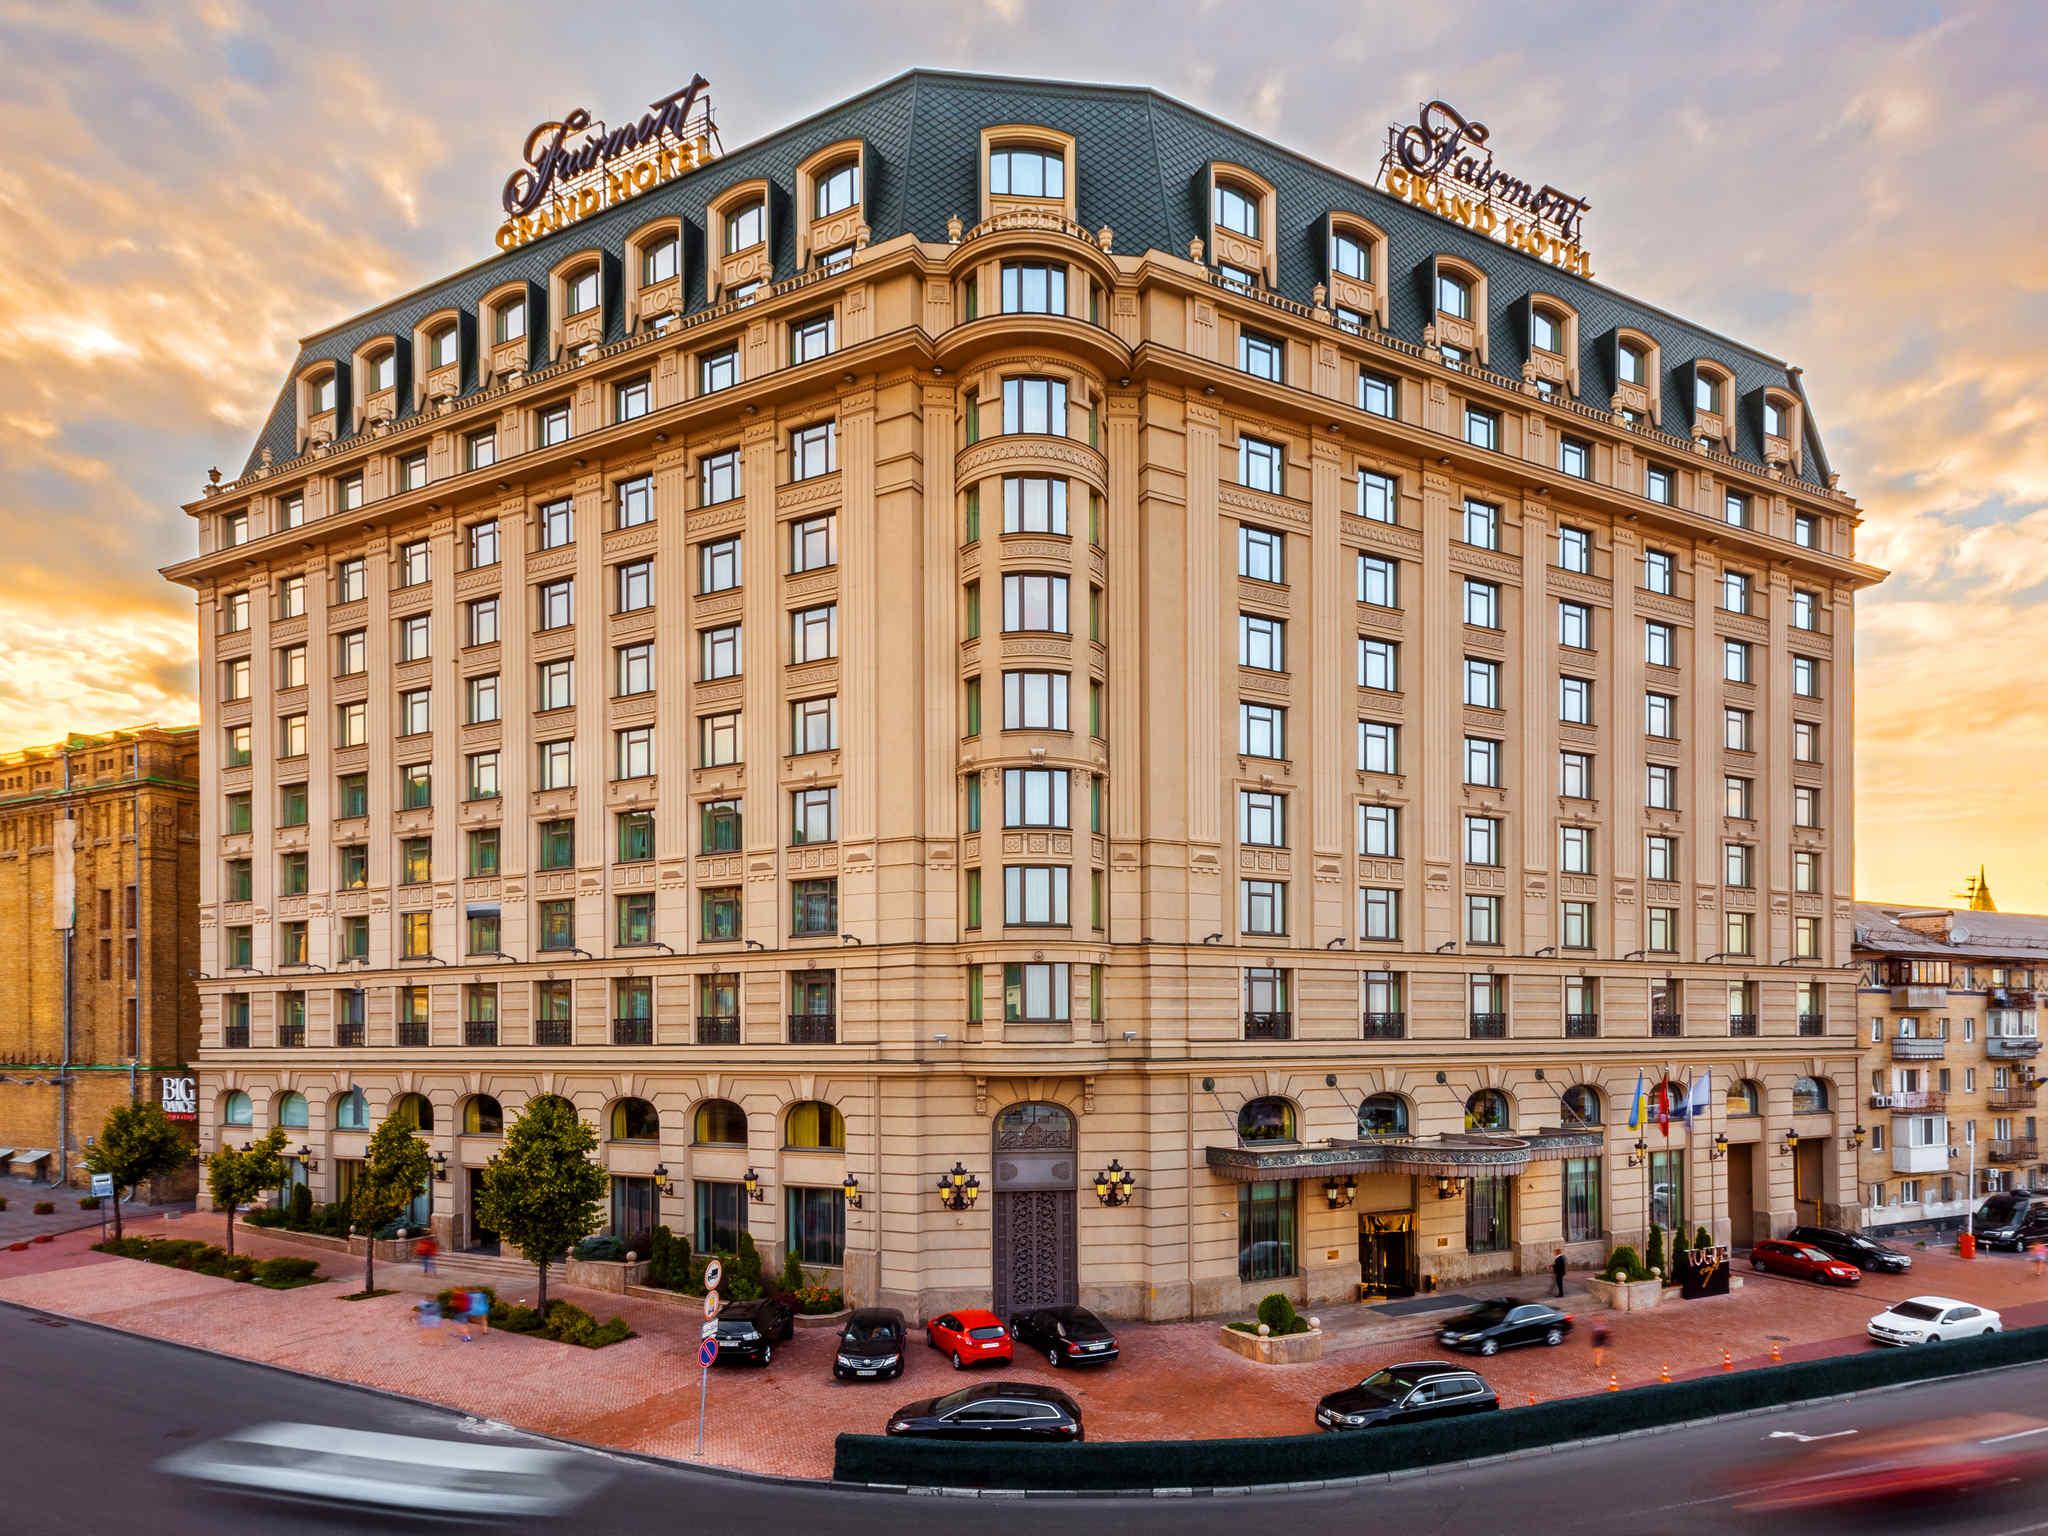 Hotel - Fairmont Grand Hotel Kyiv